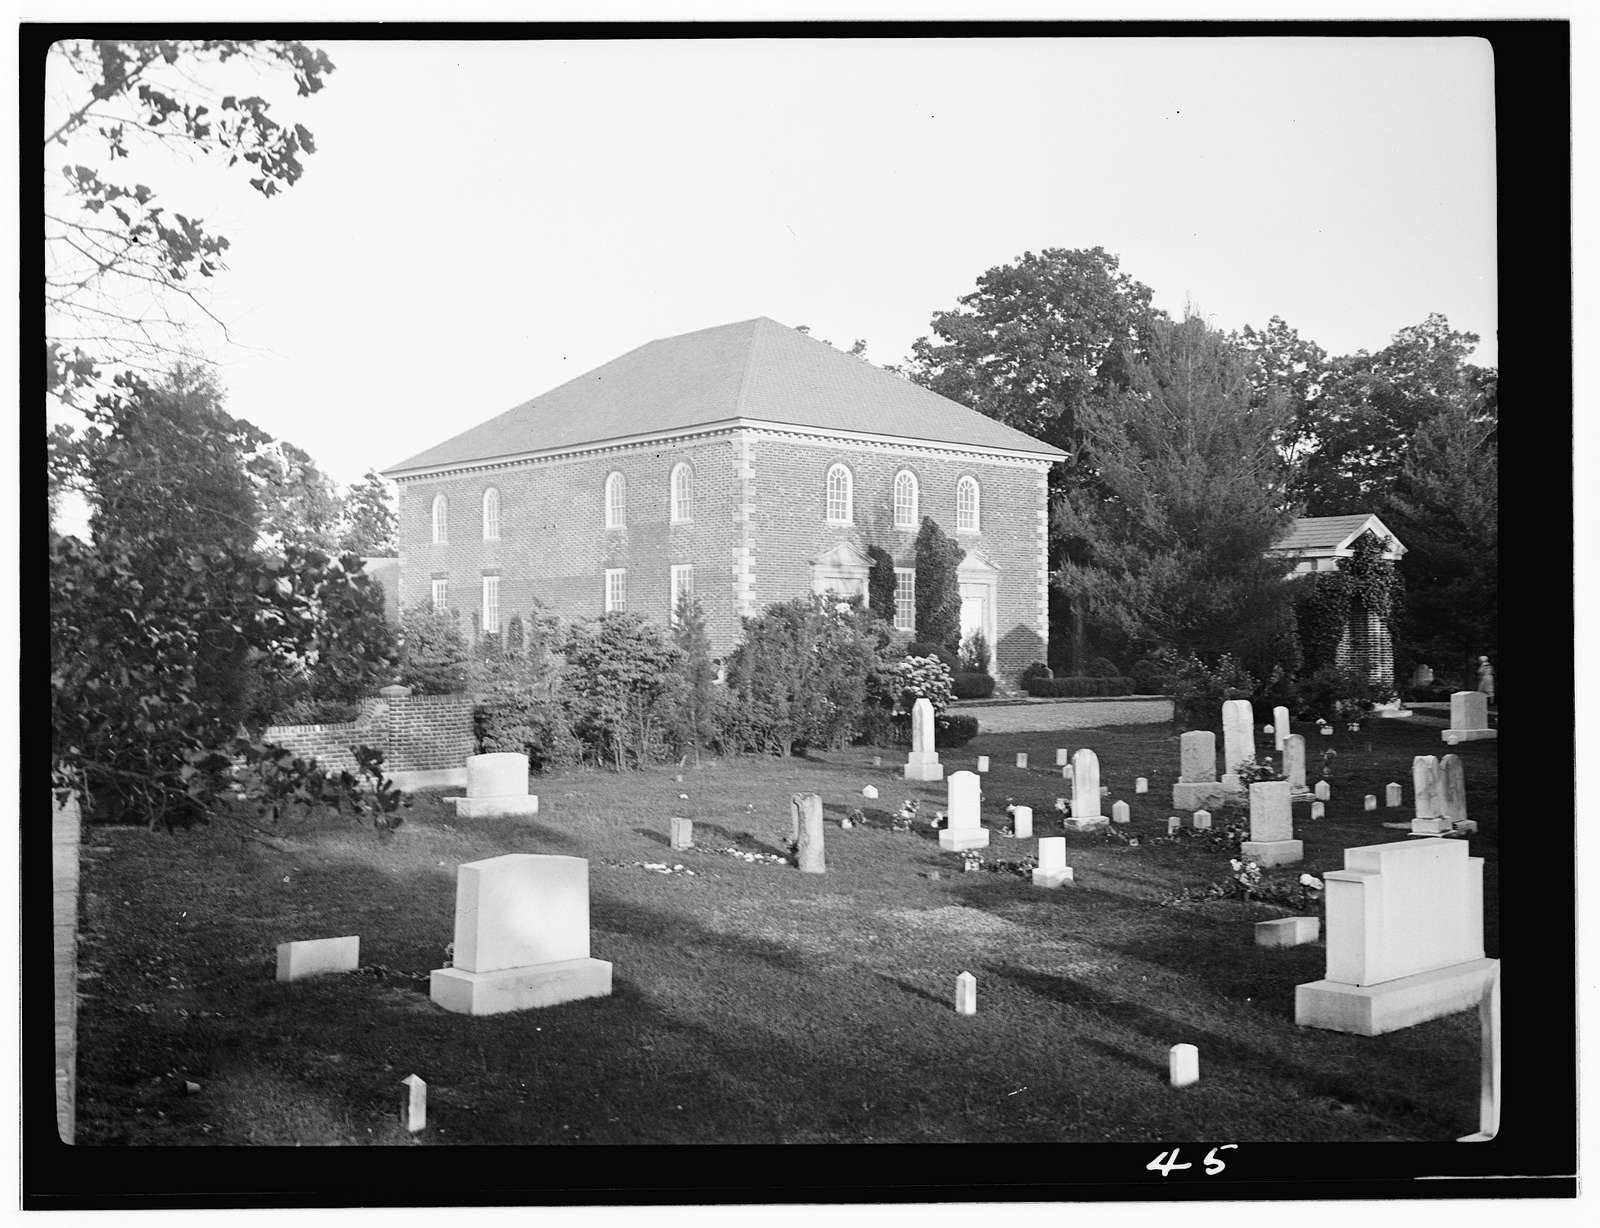 Pohick Church, 9301 Richmond Highway, Lorton, Fairfax County, VA